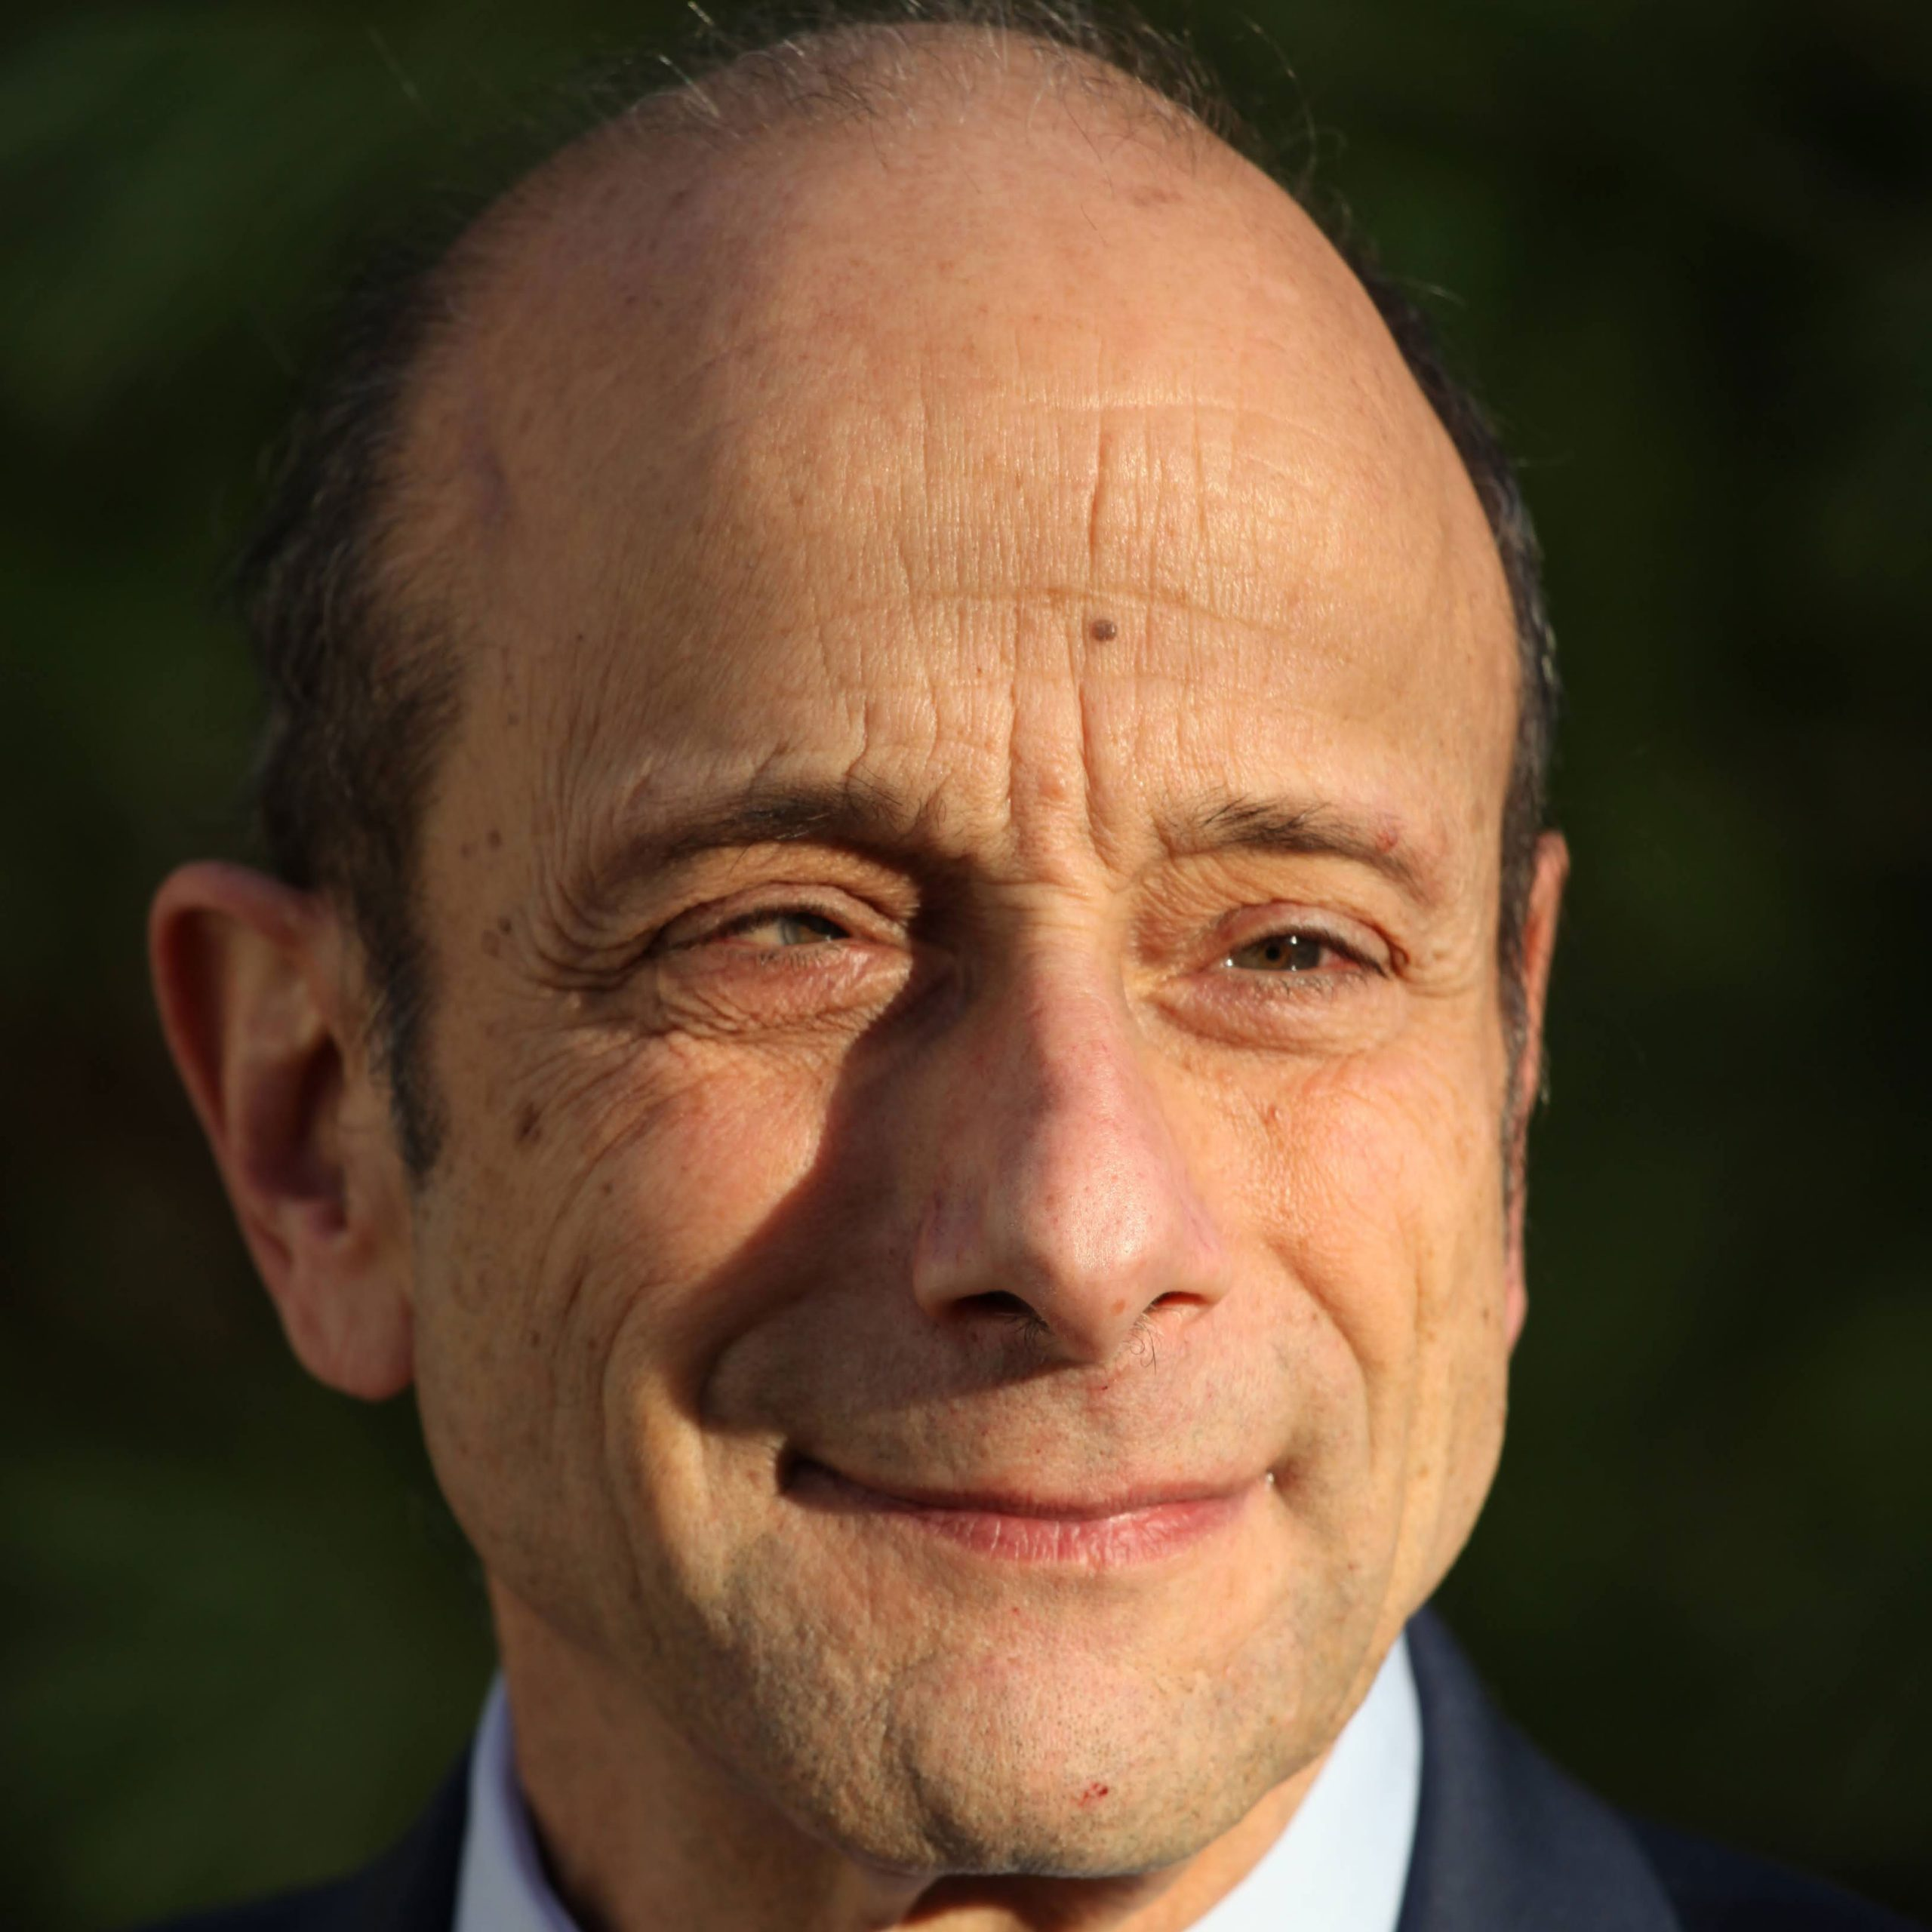 Jonathan Ben-Asher